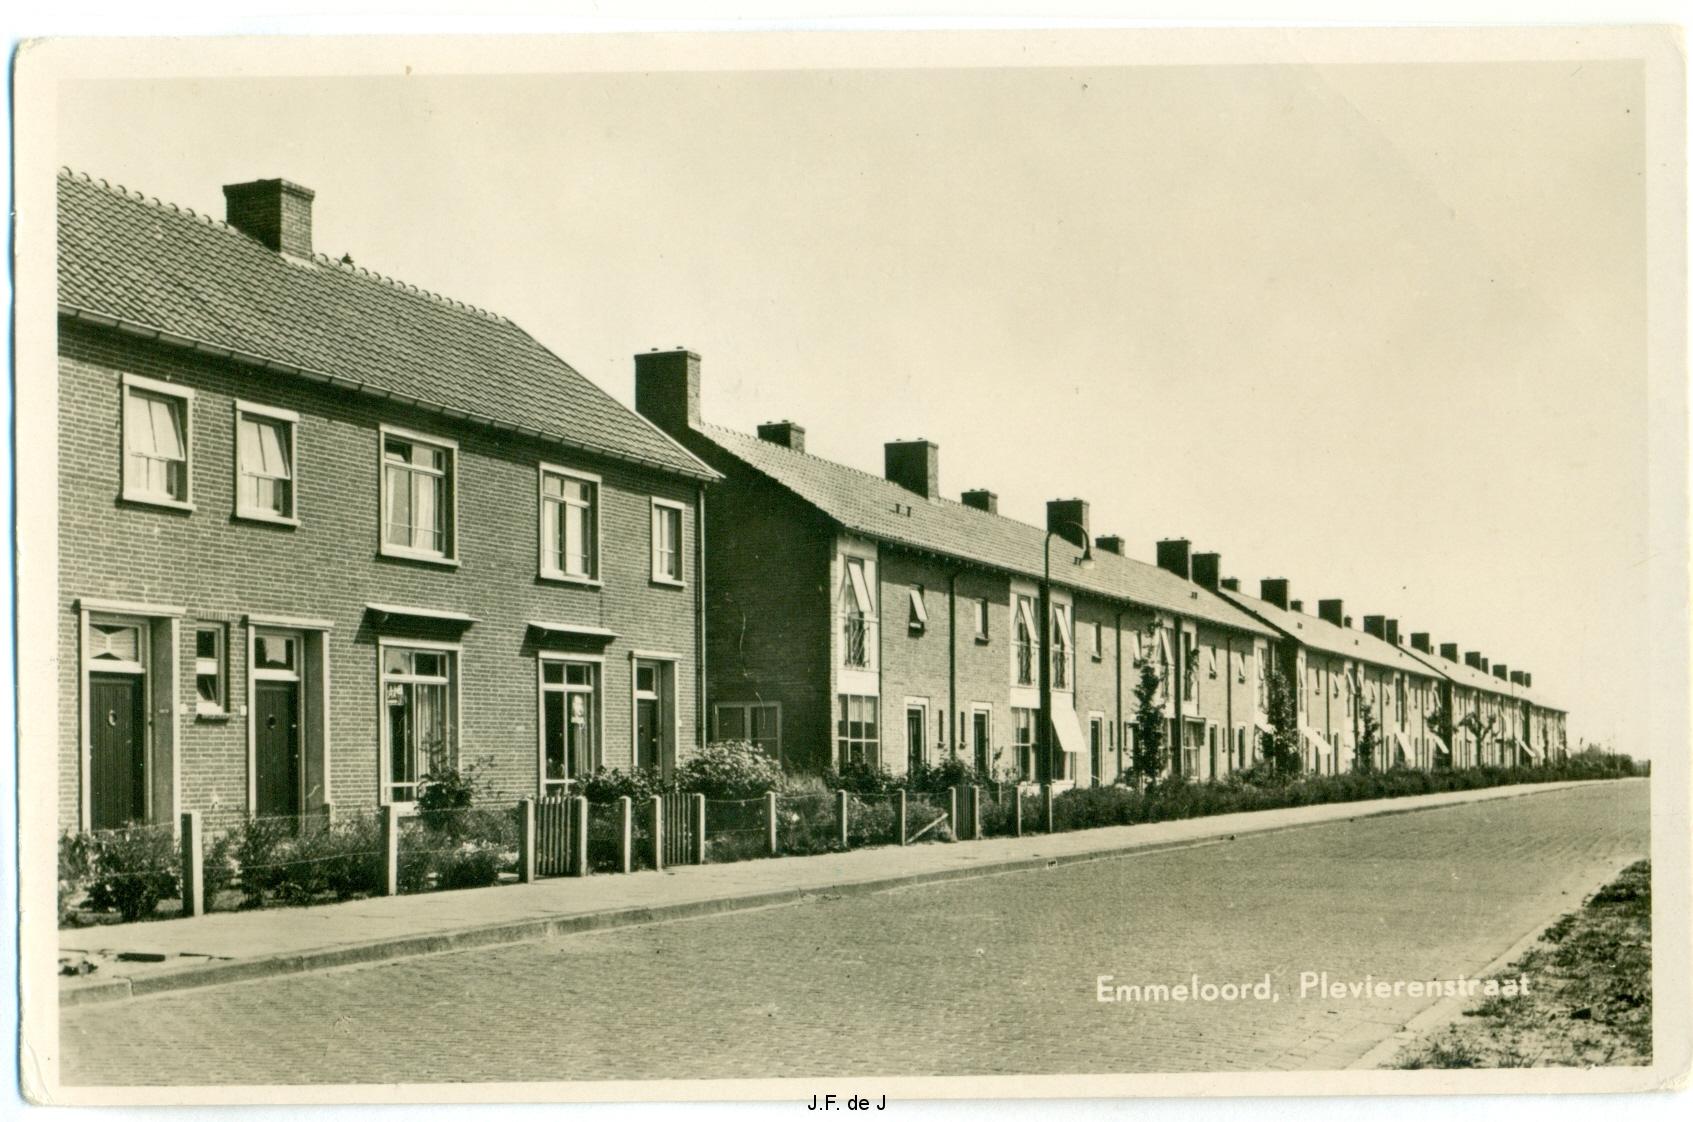 Plevierenstraat Emmeloord